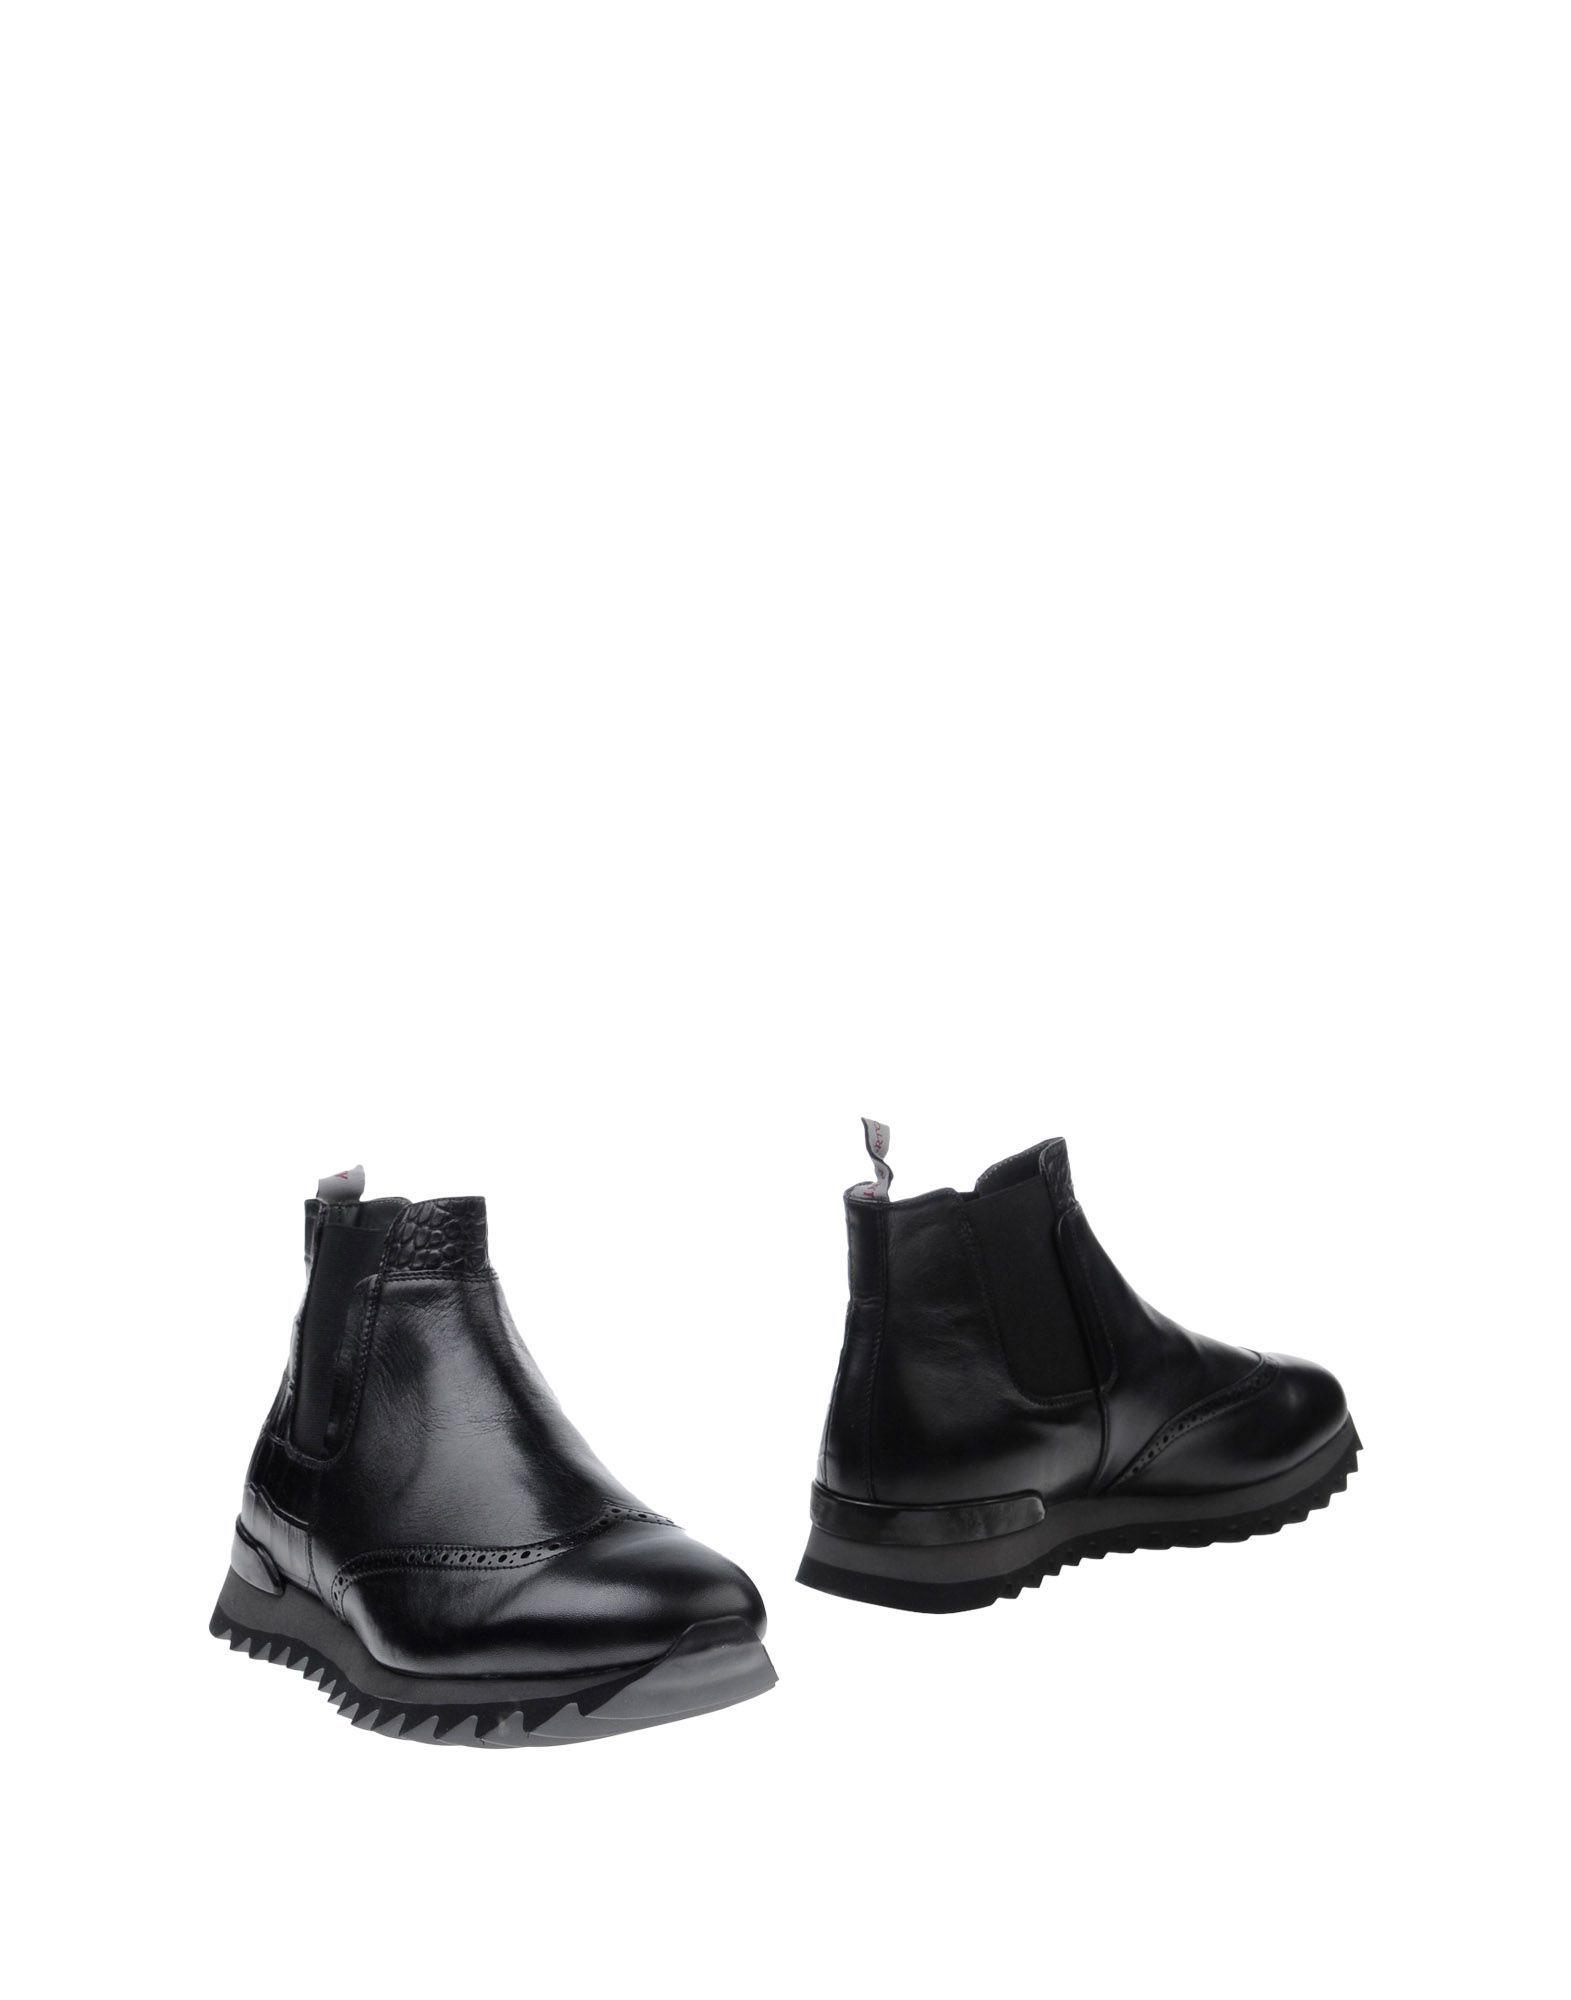 abf840a5b0c40 ALBERTO GUARDIANI .  albertoguardiani  shoes